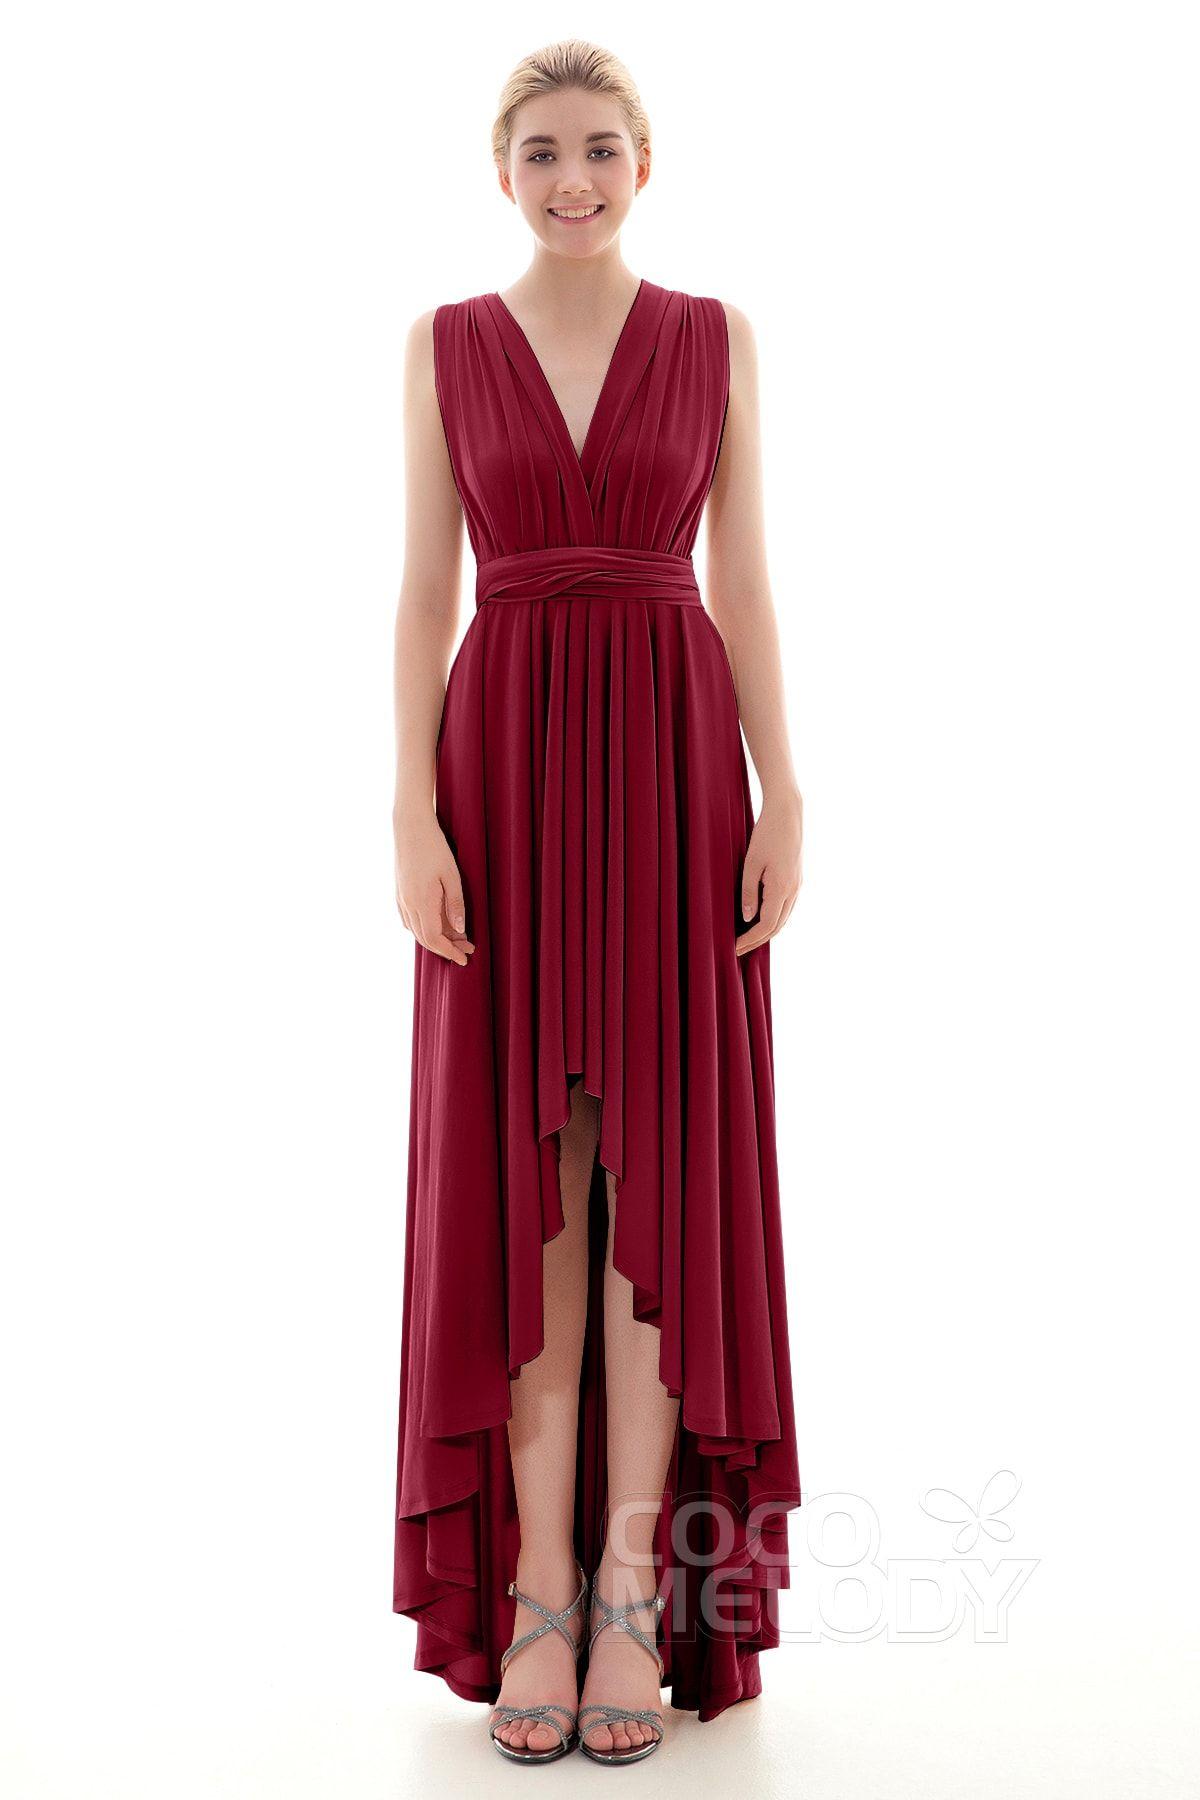 Knitted wedding dress  Timeless Asymmetrical Natural HighLow Knitted Fabric Sleeveless